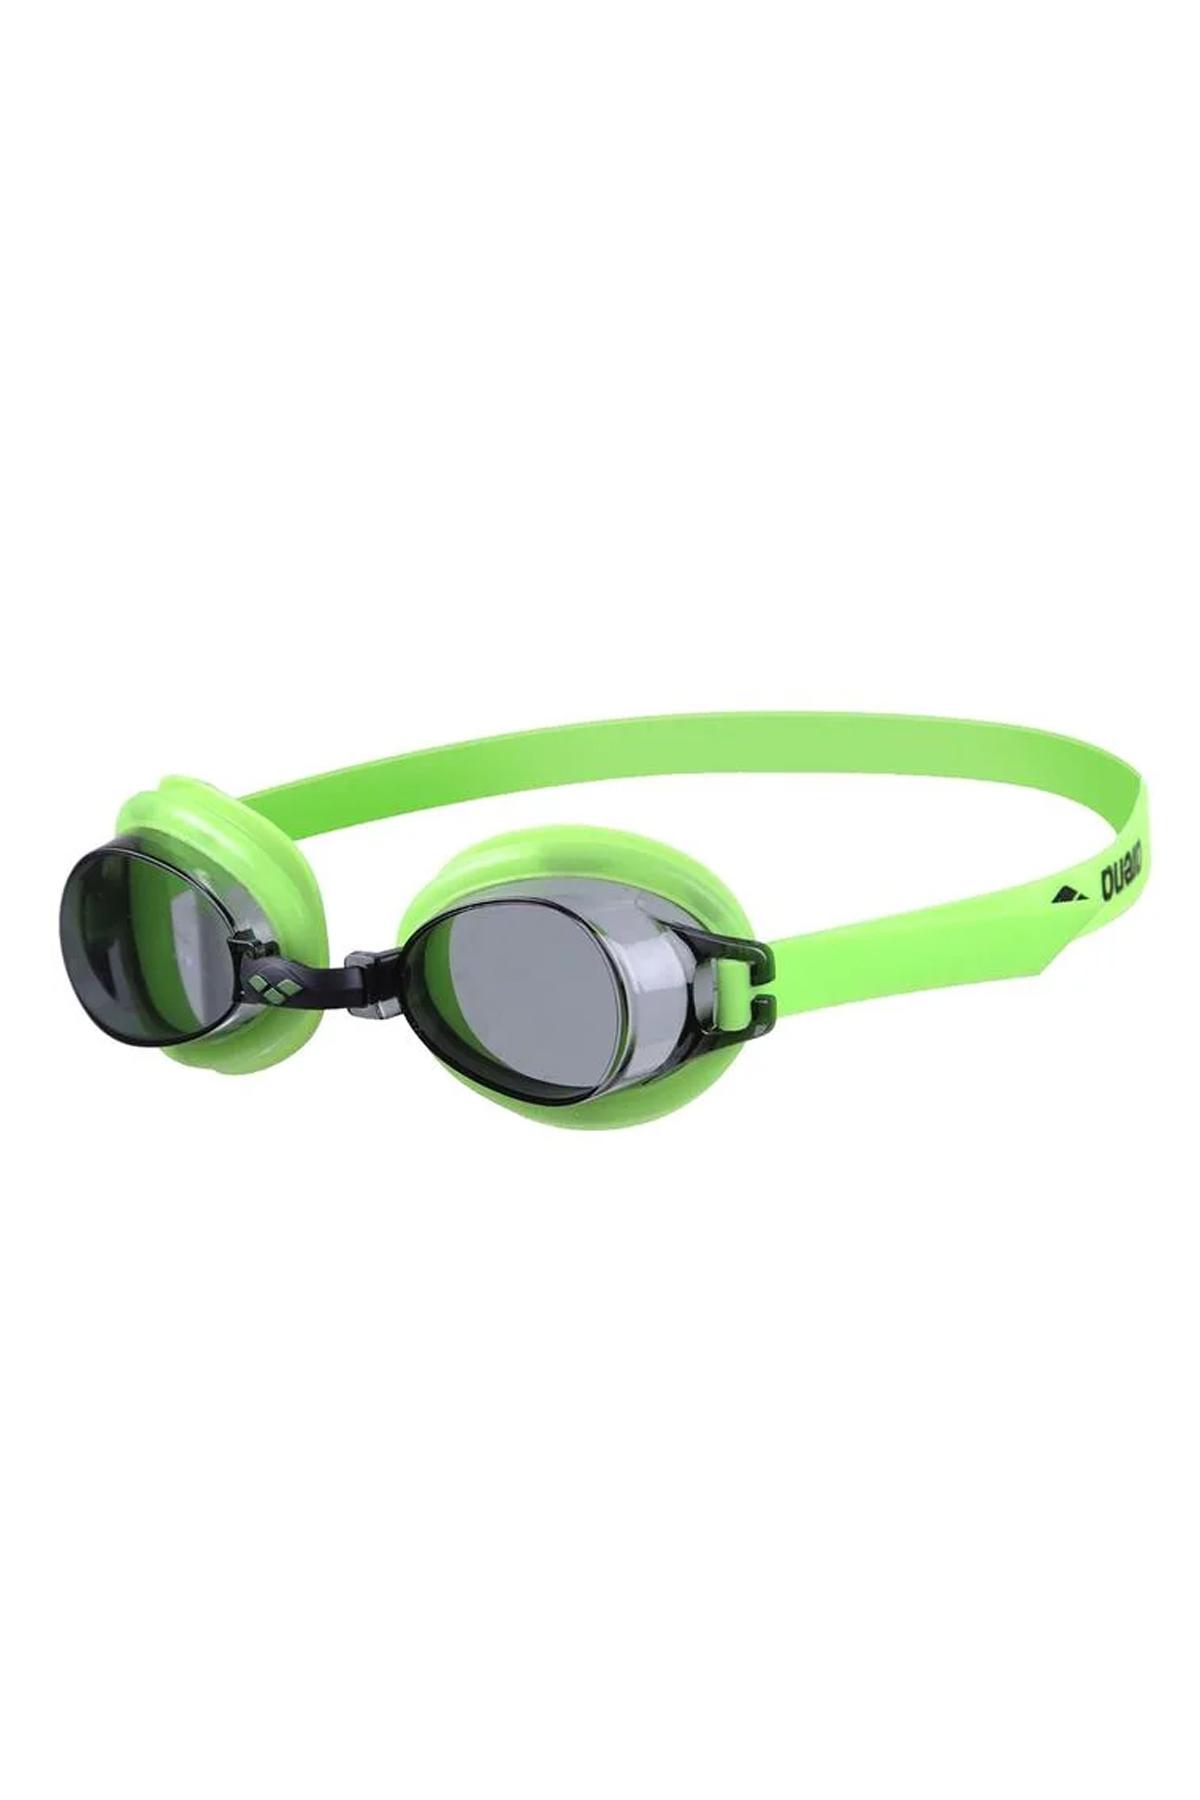 Arena Bubble 3 Junior Yüzücü Gözlüğü (9239565-YEŞ/SİY)